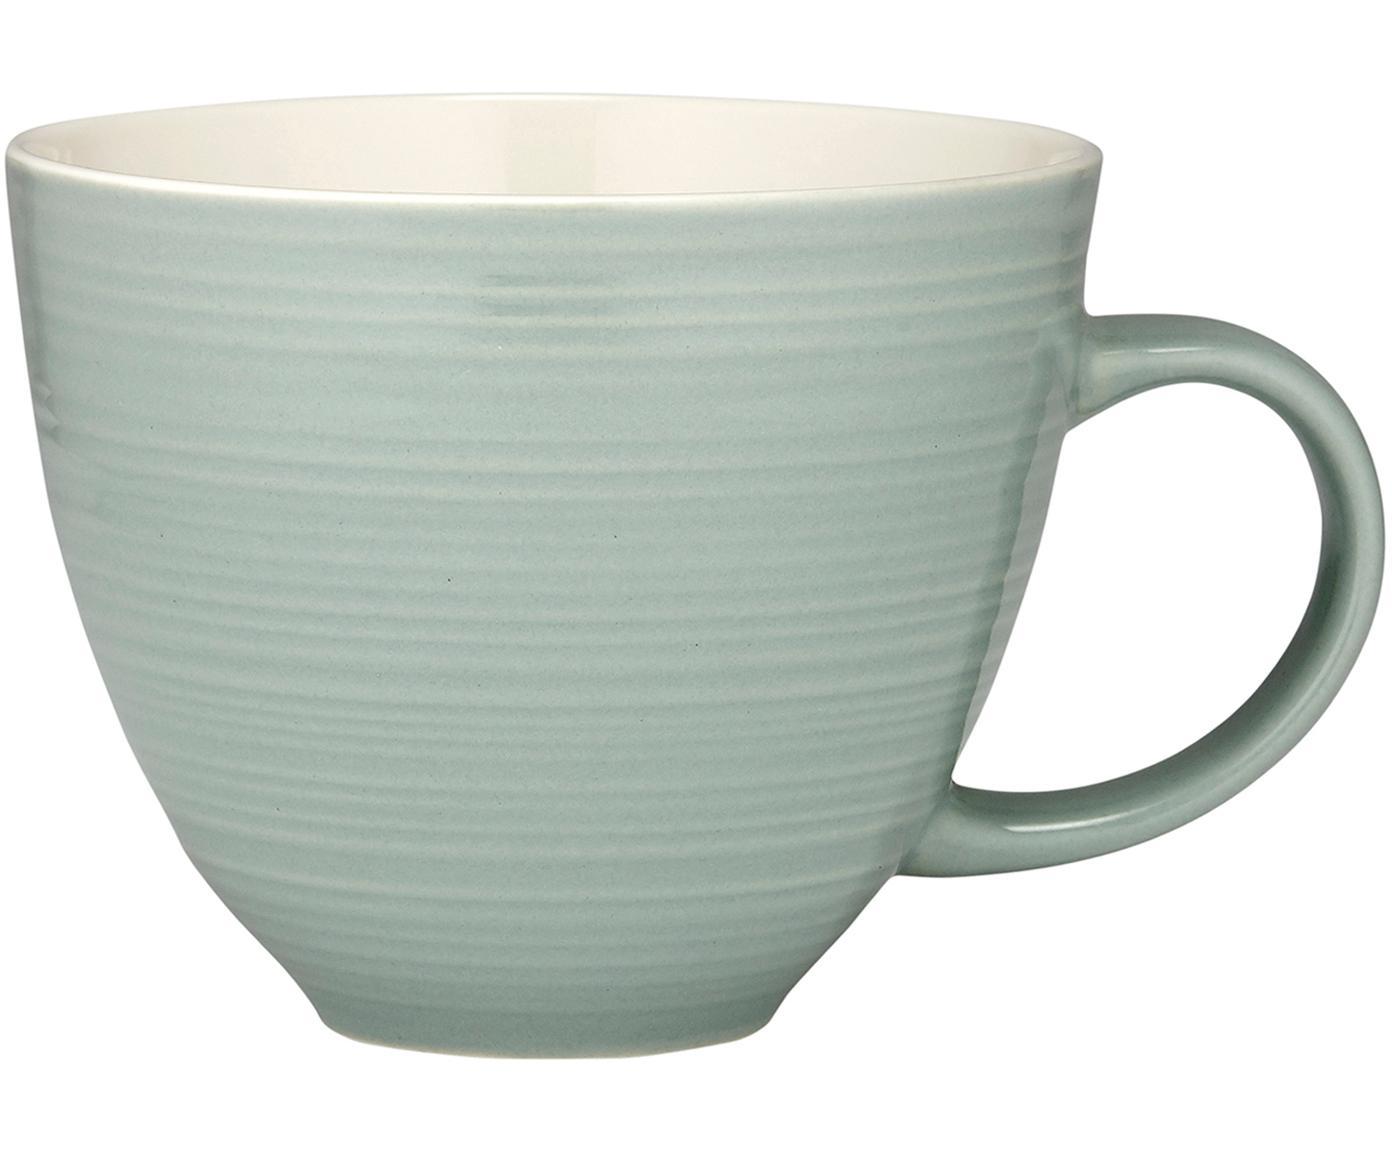 Kaffeetassen Darby, 4 Stück, New Bone China, Grün, Gebrochenes Weiss, Ø 11 x H 10 cm